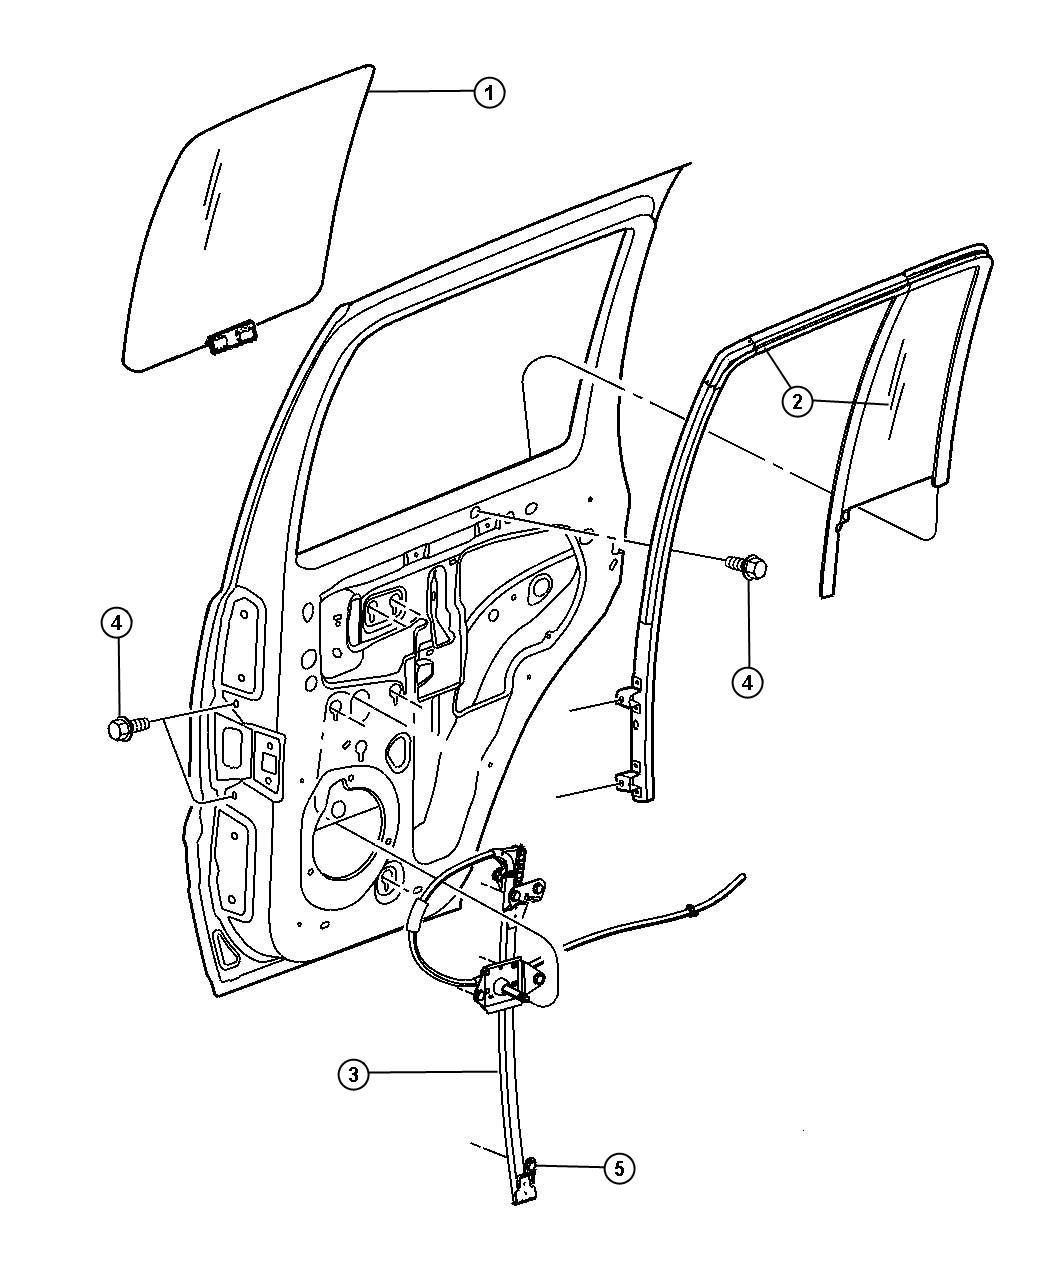 Chrysler Sebring Door Parts Diagram